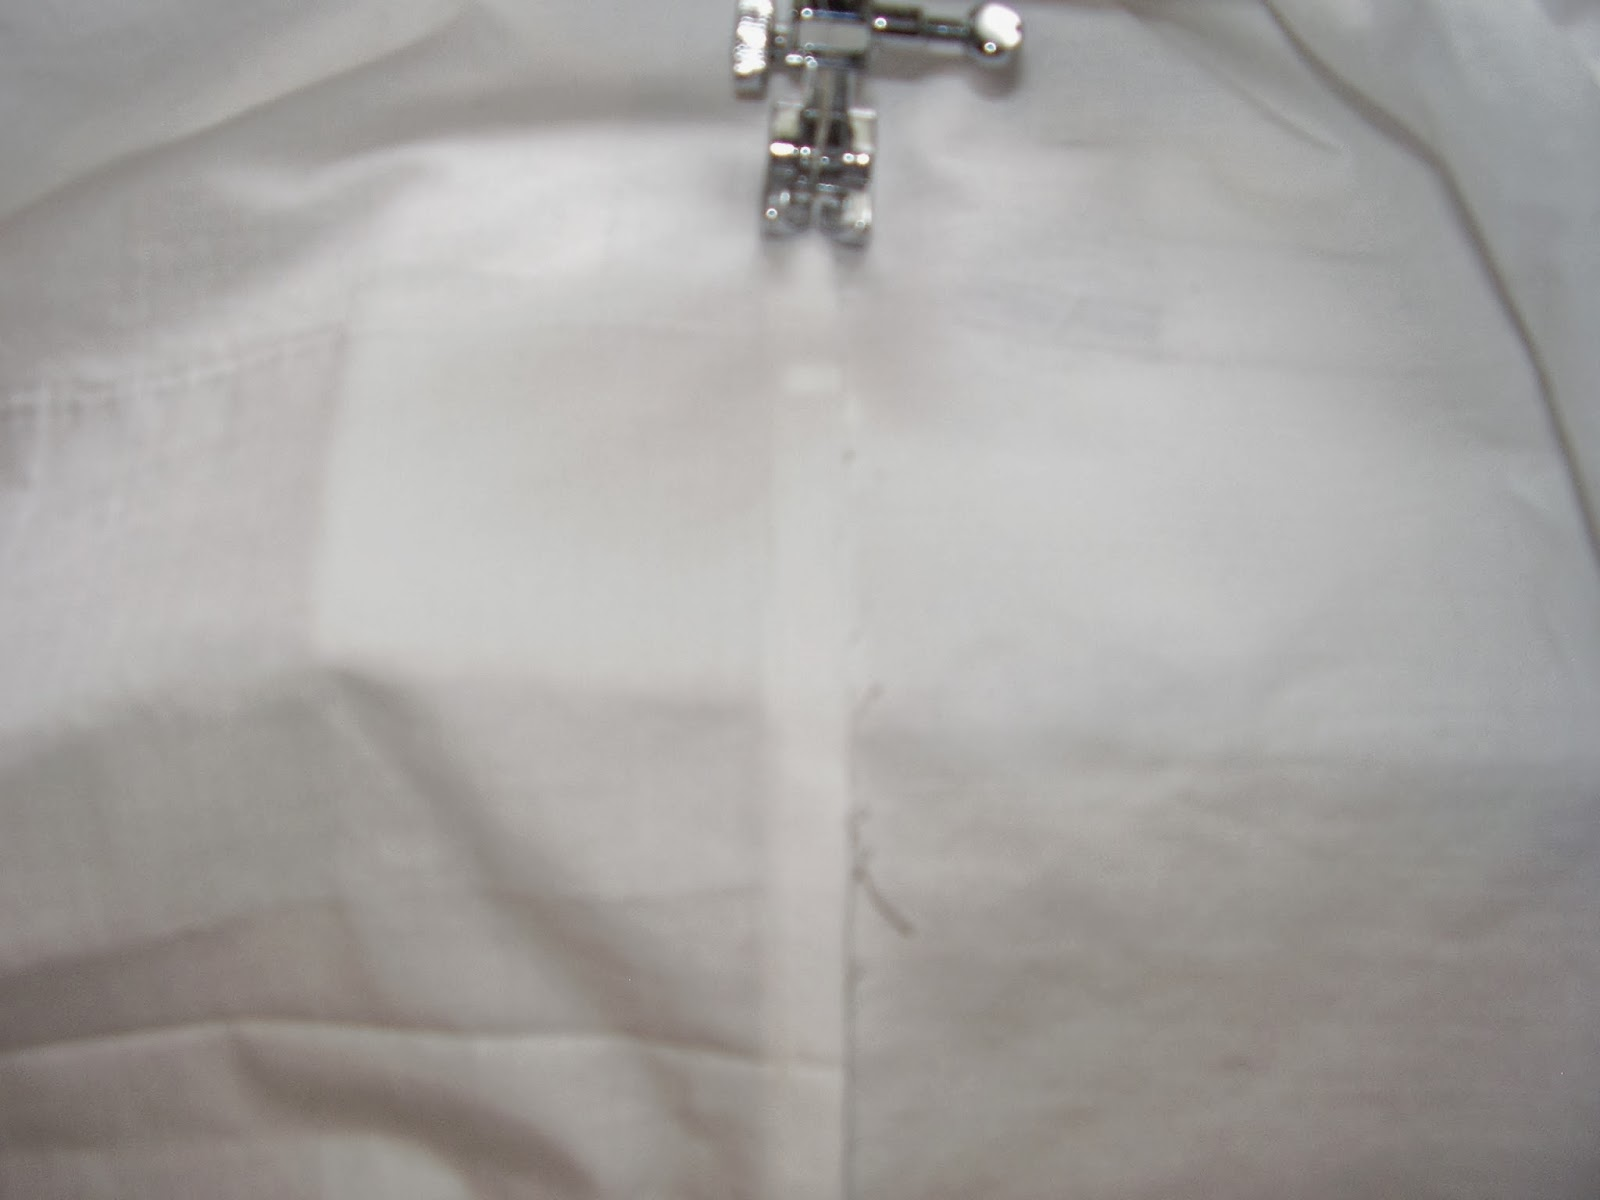 Felling seams on a sewing machine.